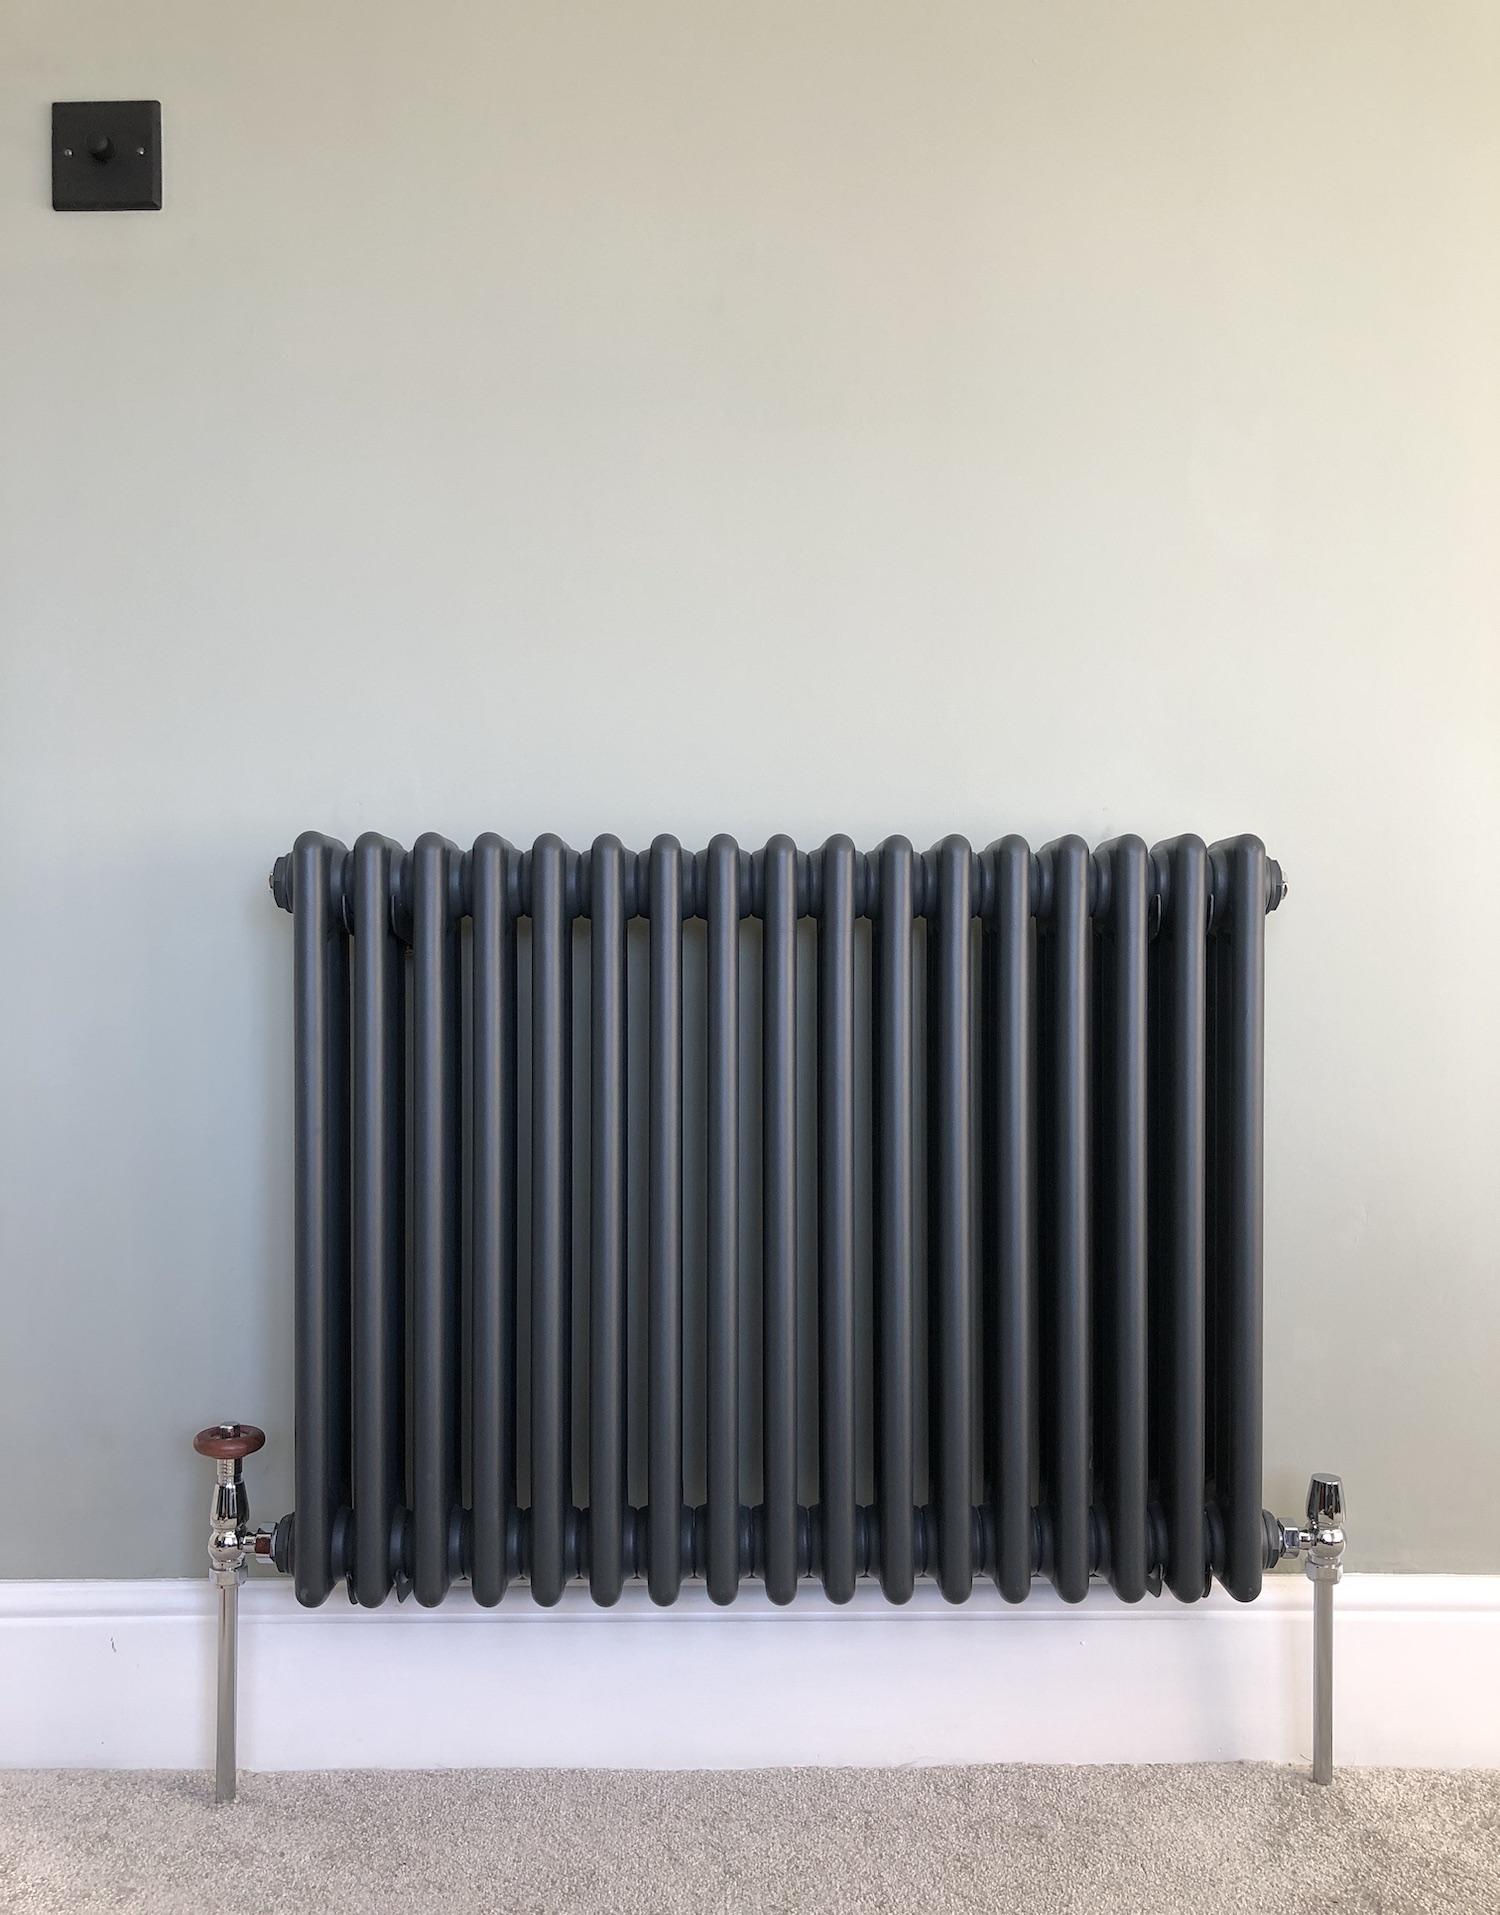 Anthracite triple column radiator